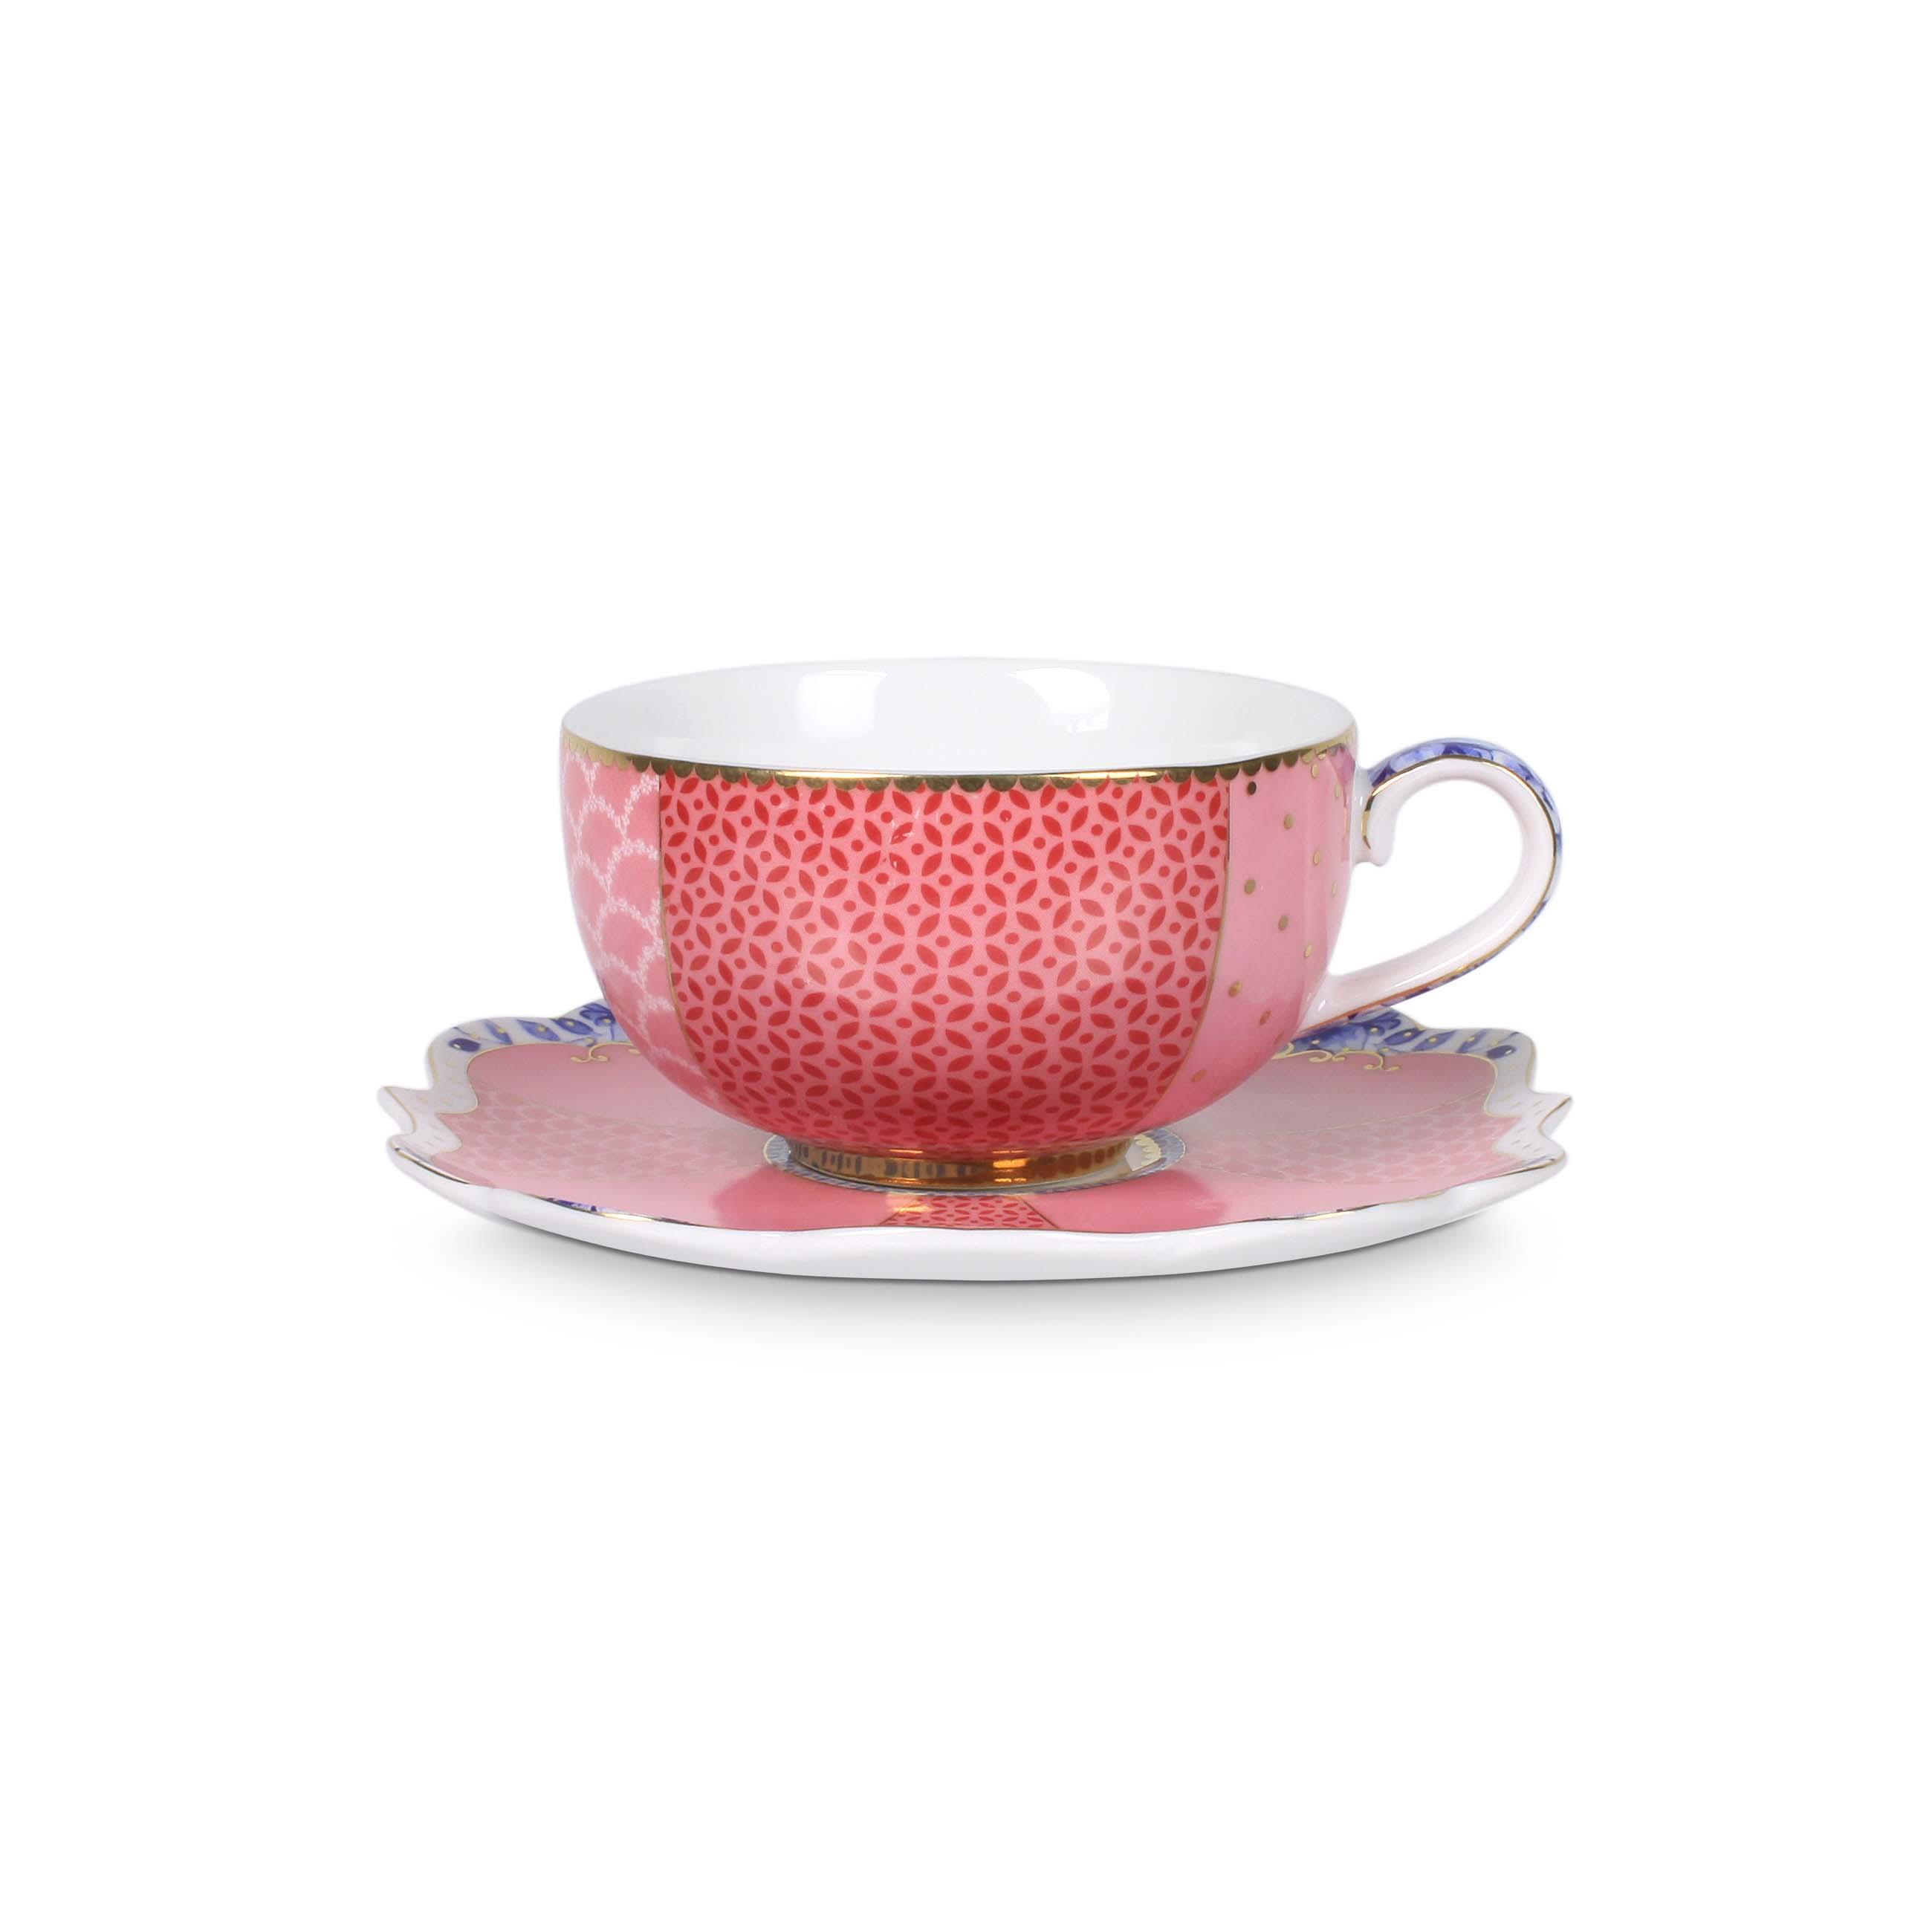 Pip Studio Royal Espresso Tasse & Untertasse Pink